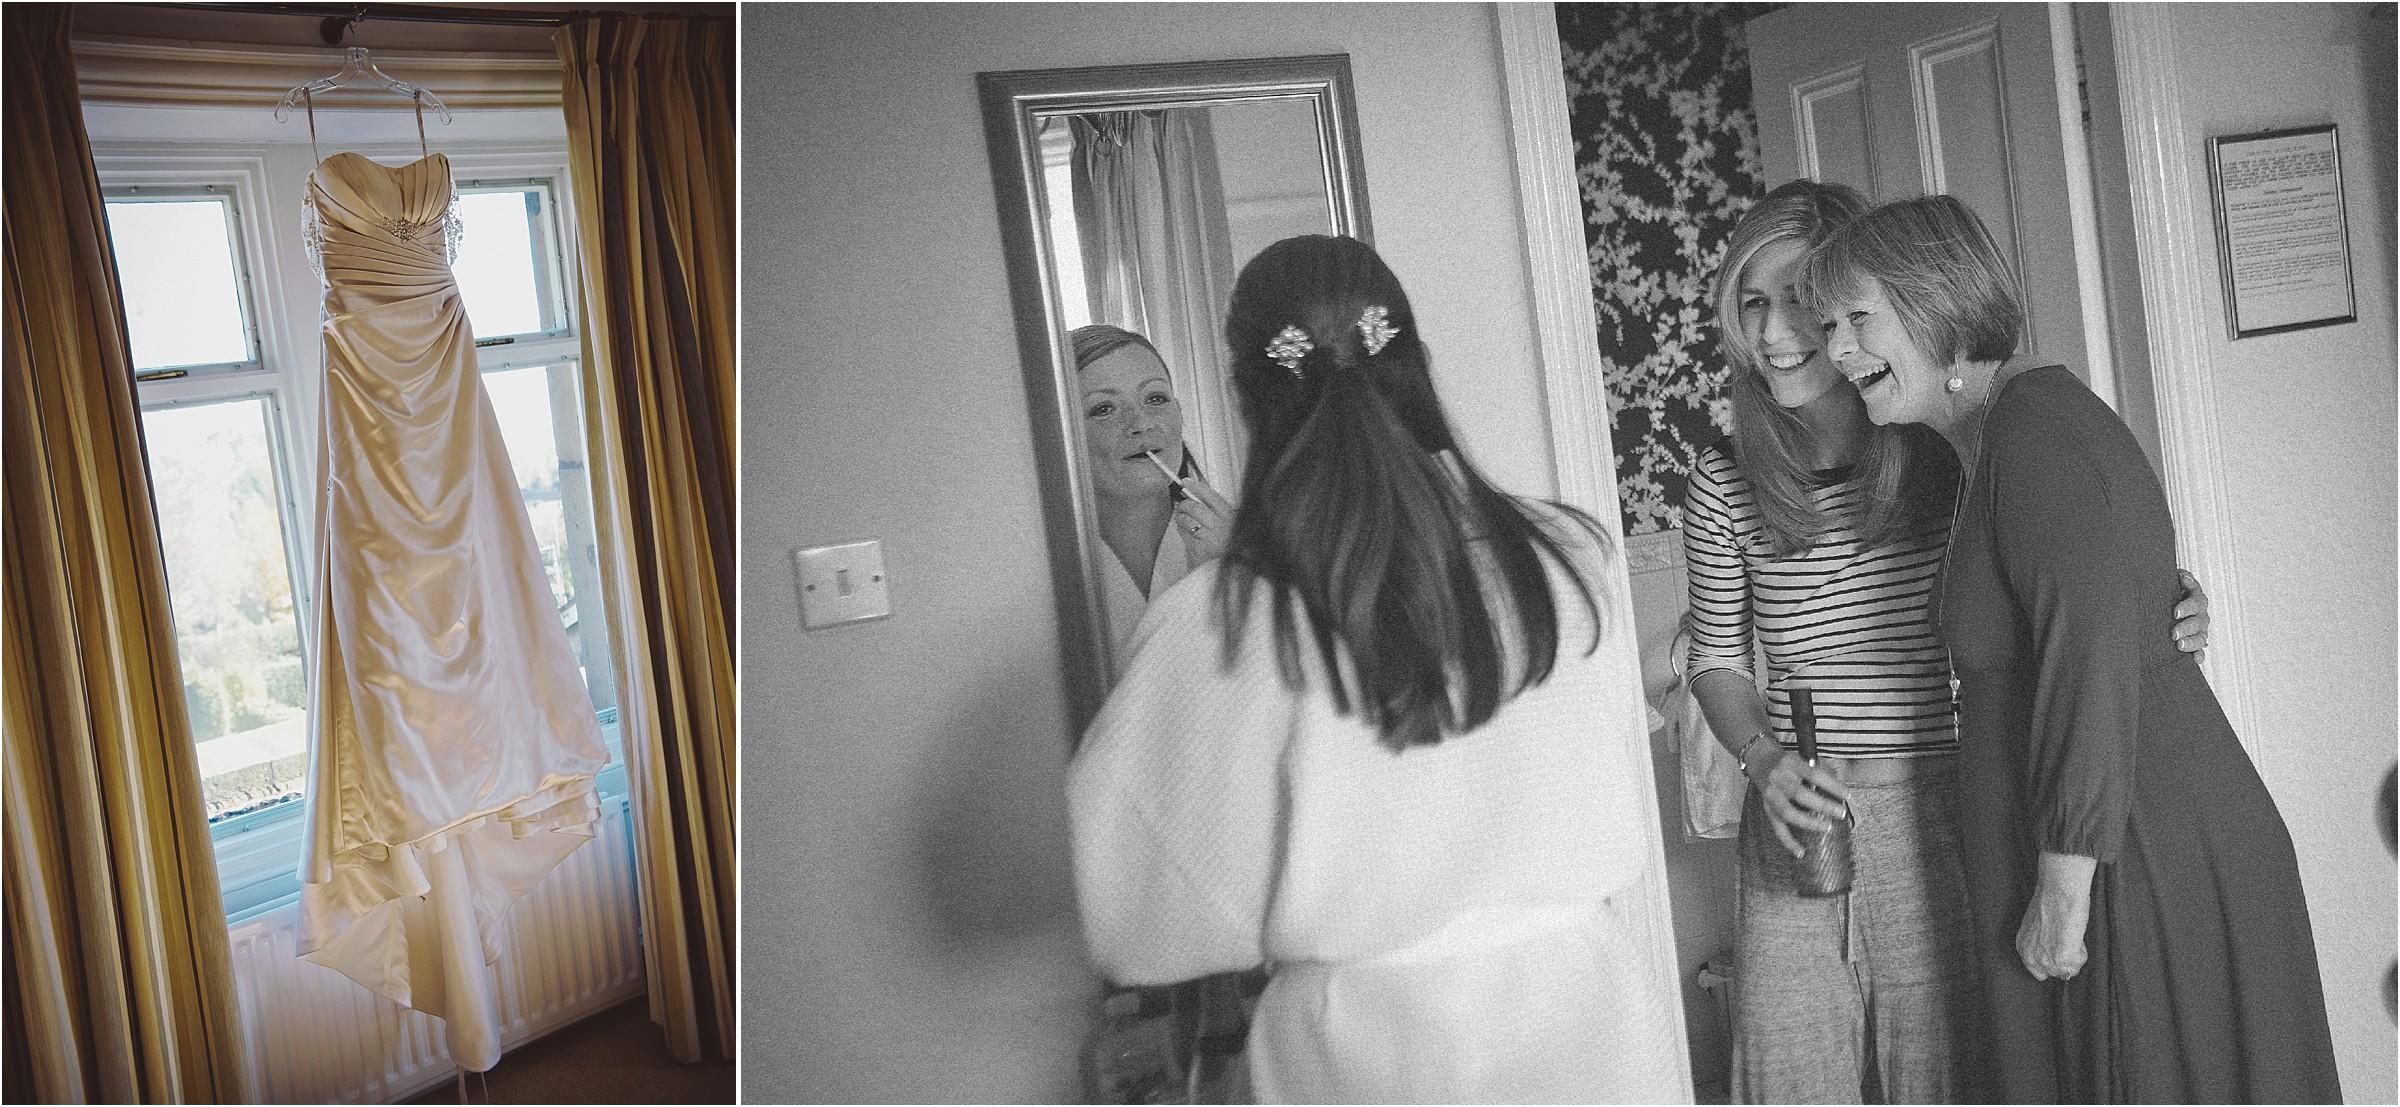 006 wedding photography doxford hall northumberlandDSC_0438e